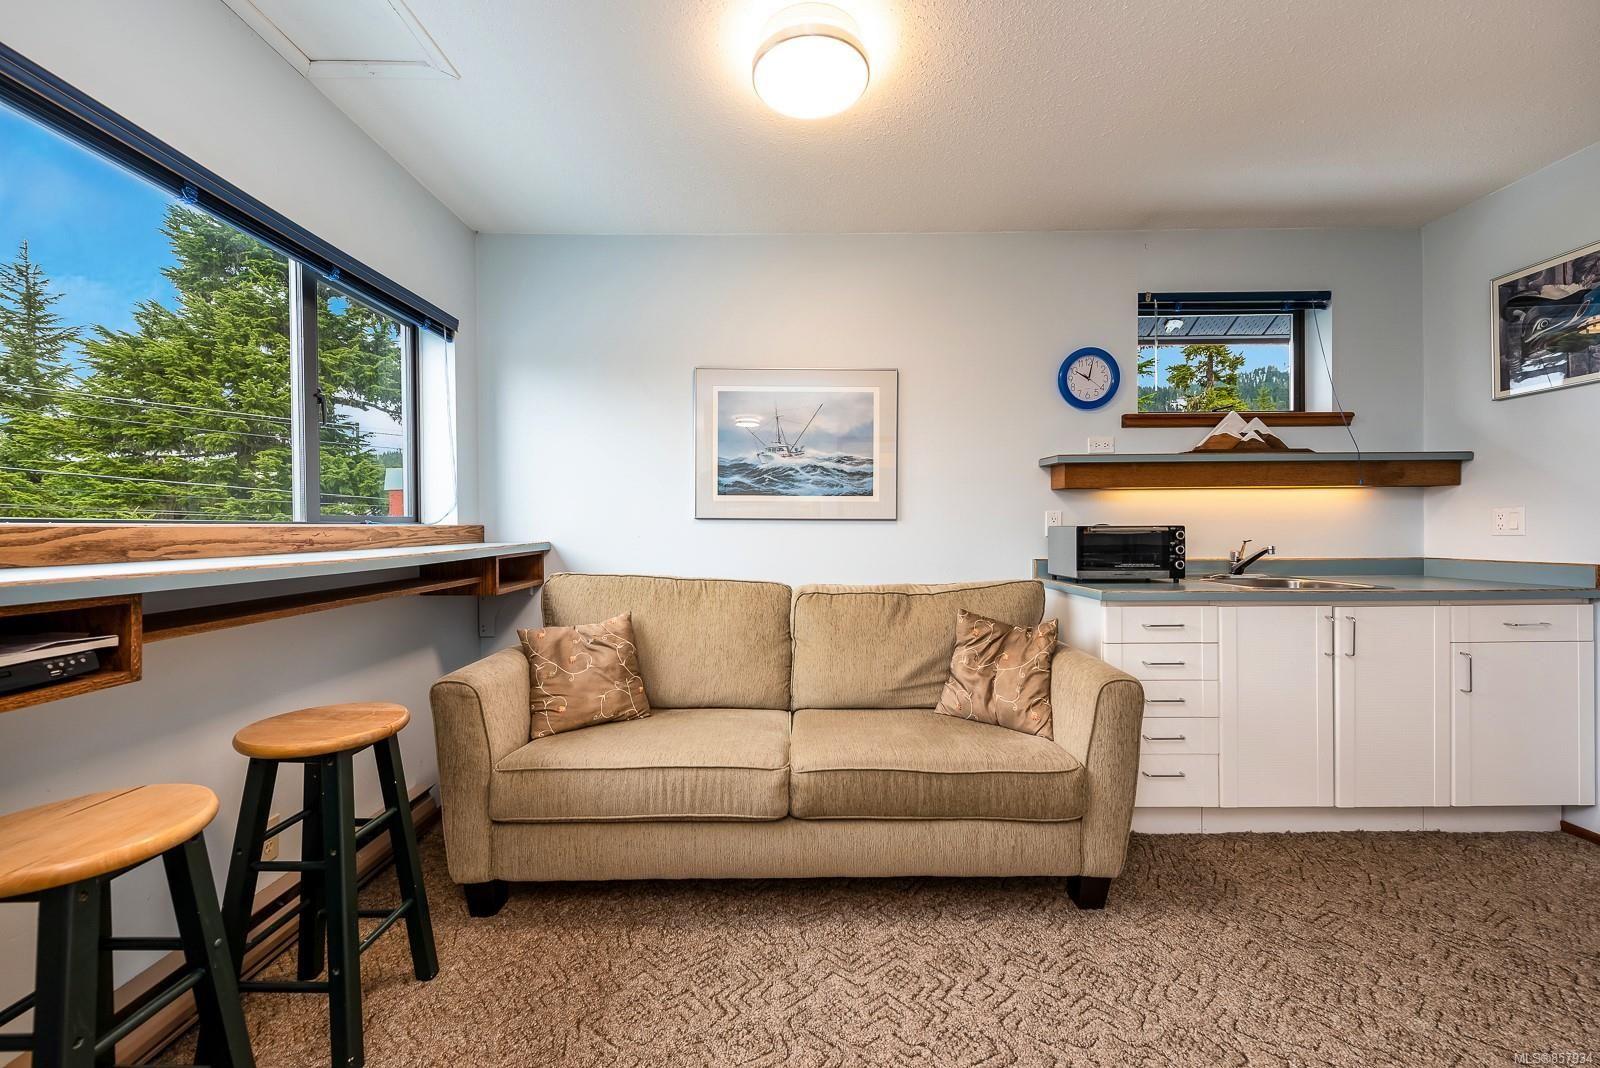 Photo 23: Photos: 998 STRATA Way in : CV Mt Washington House for sale (Comox Valley)  : MLS®# 857934